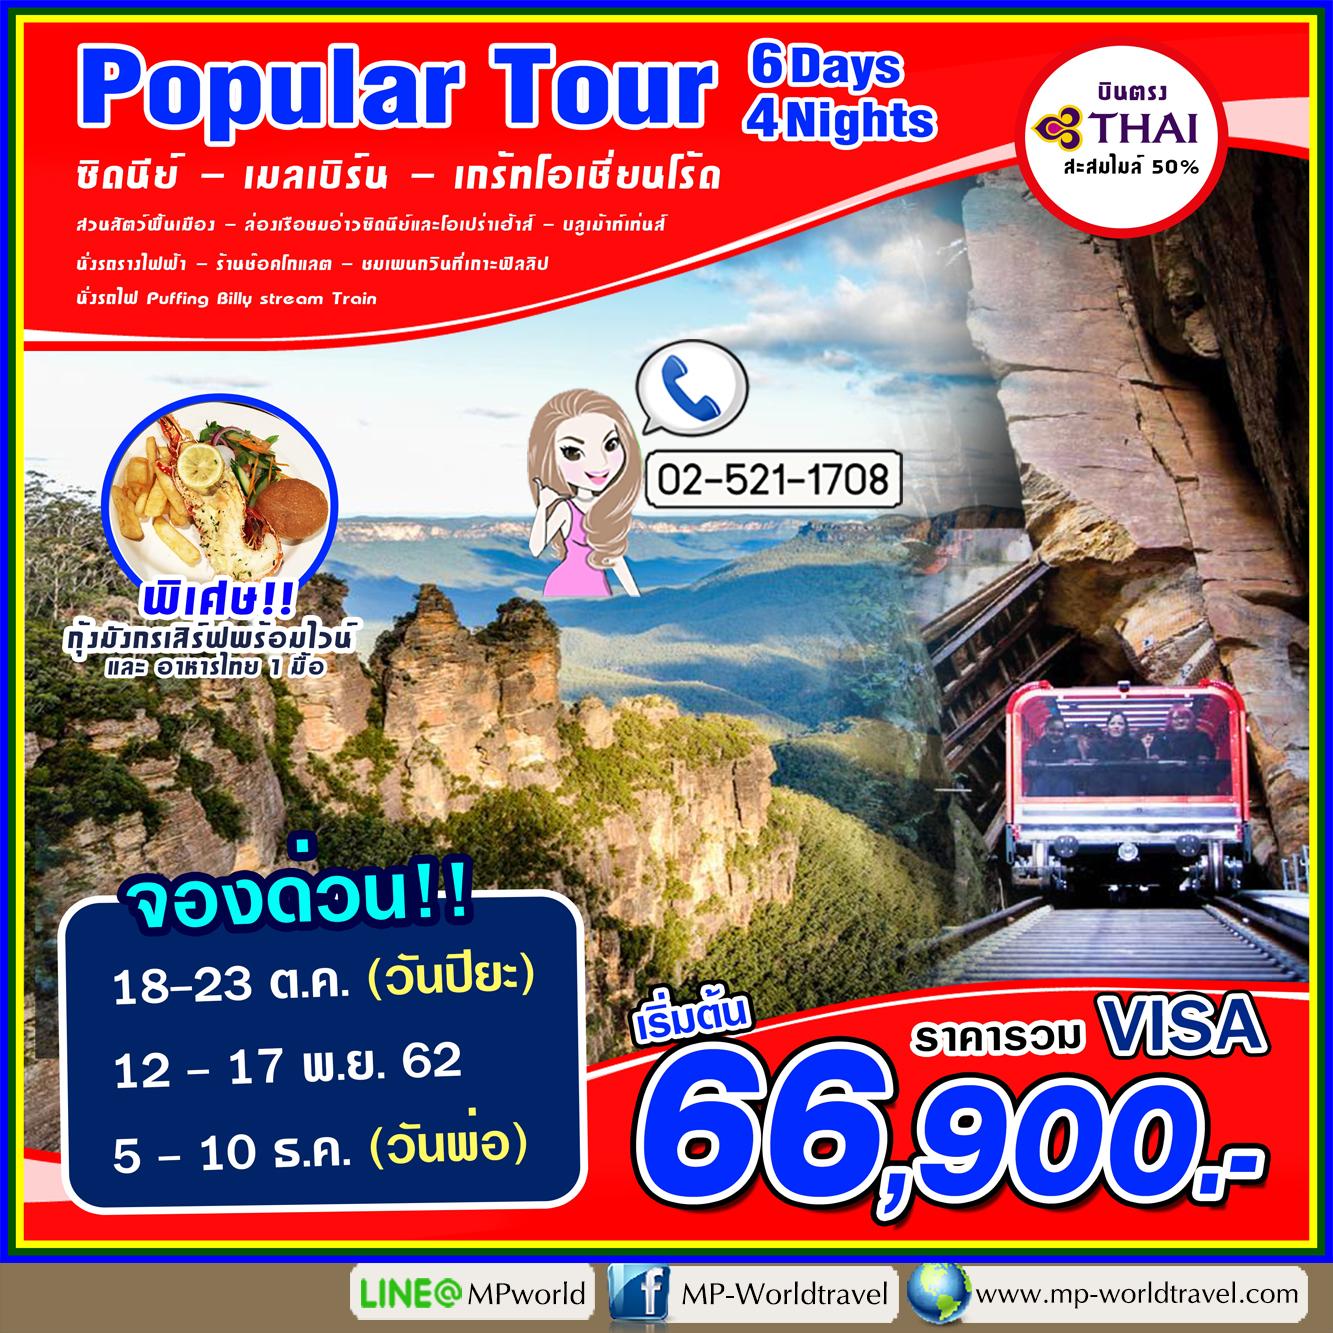 POPULAR TOUR AUSTRALIA 6D 4N TG